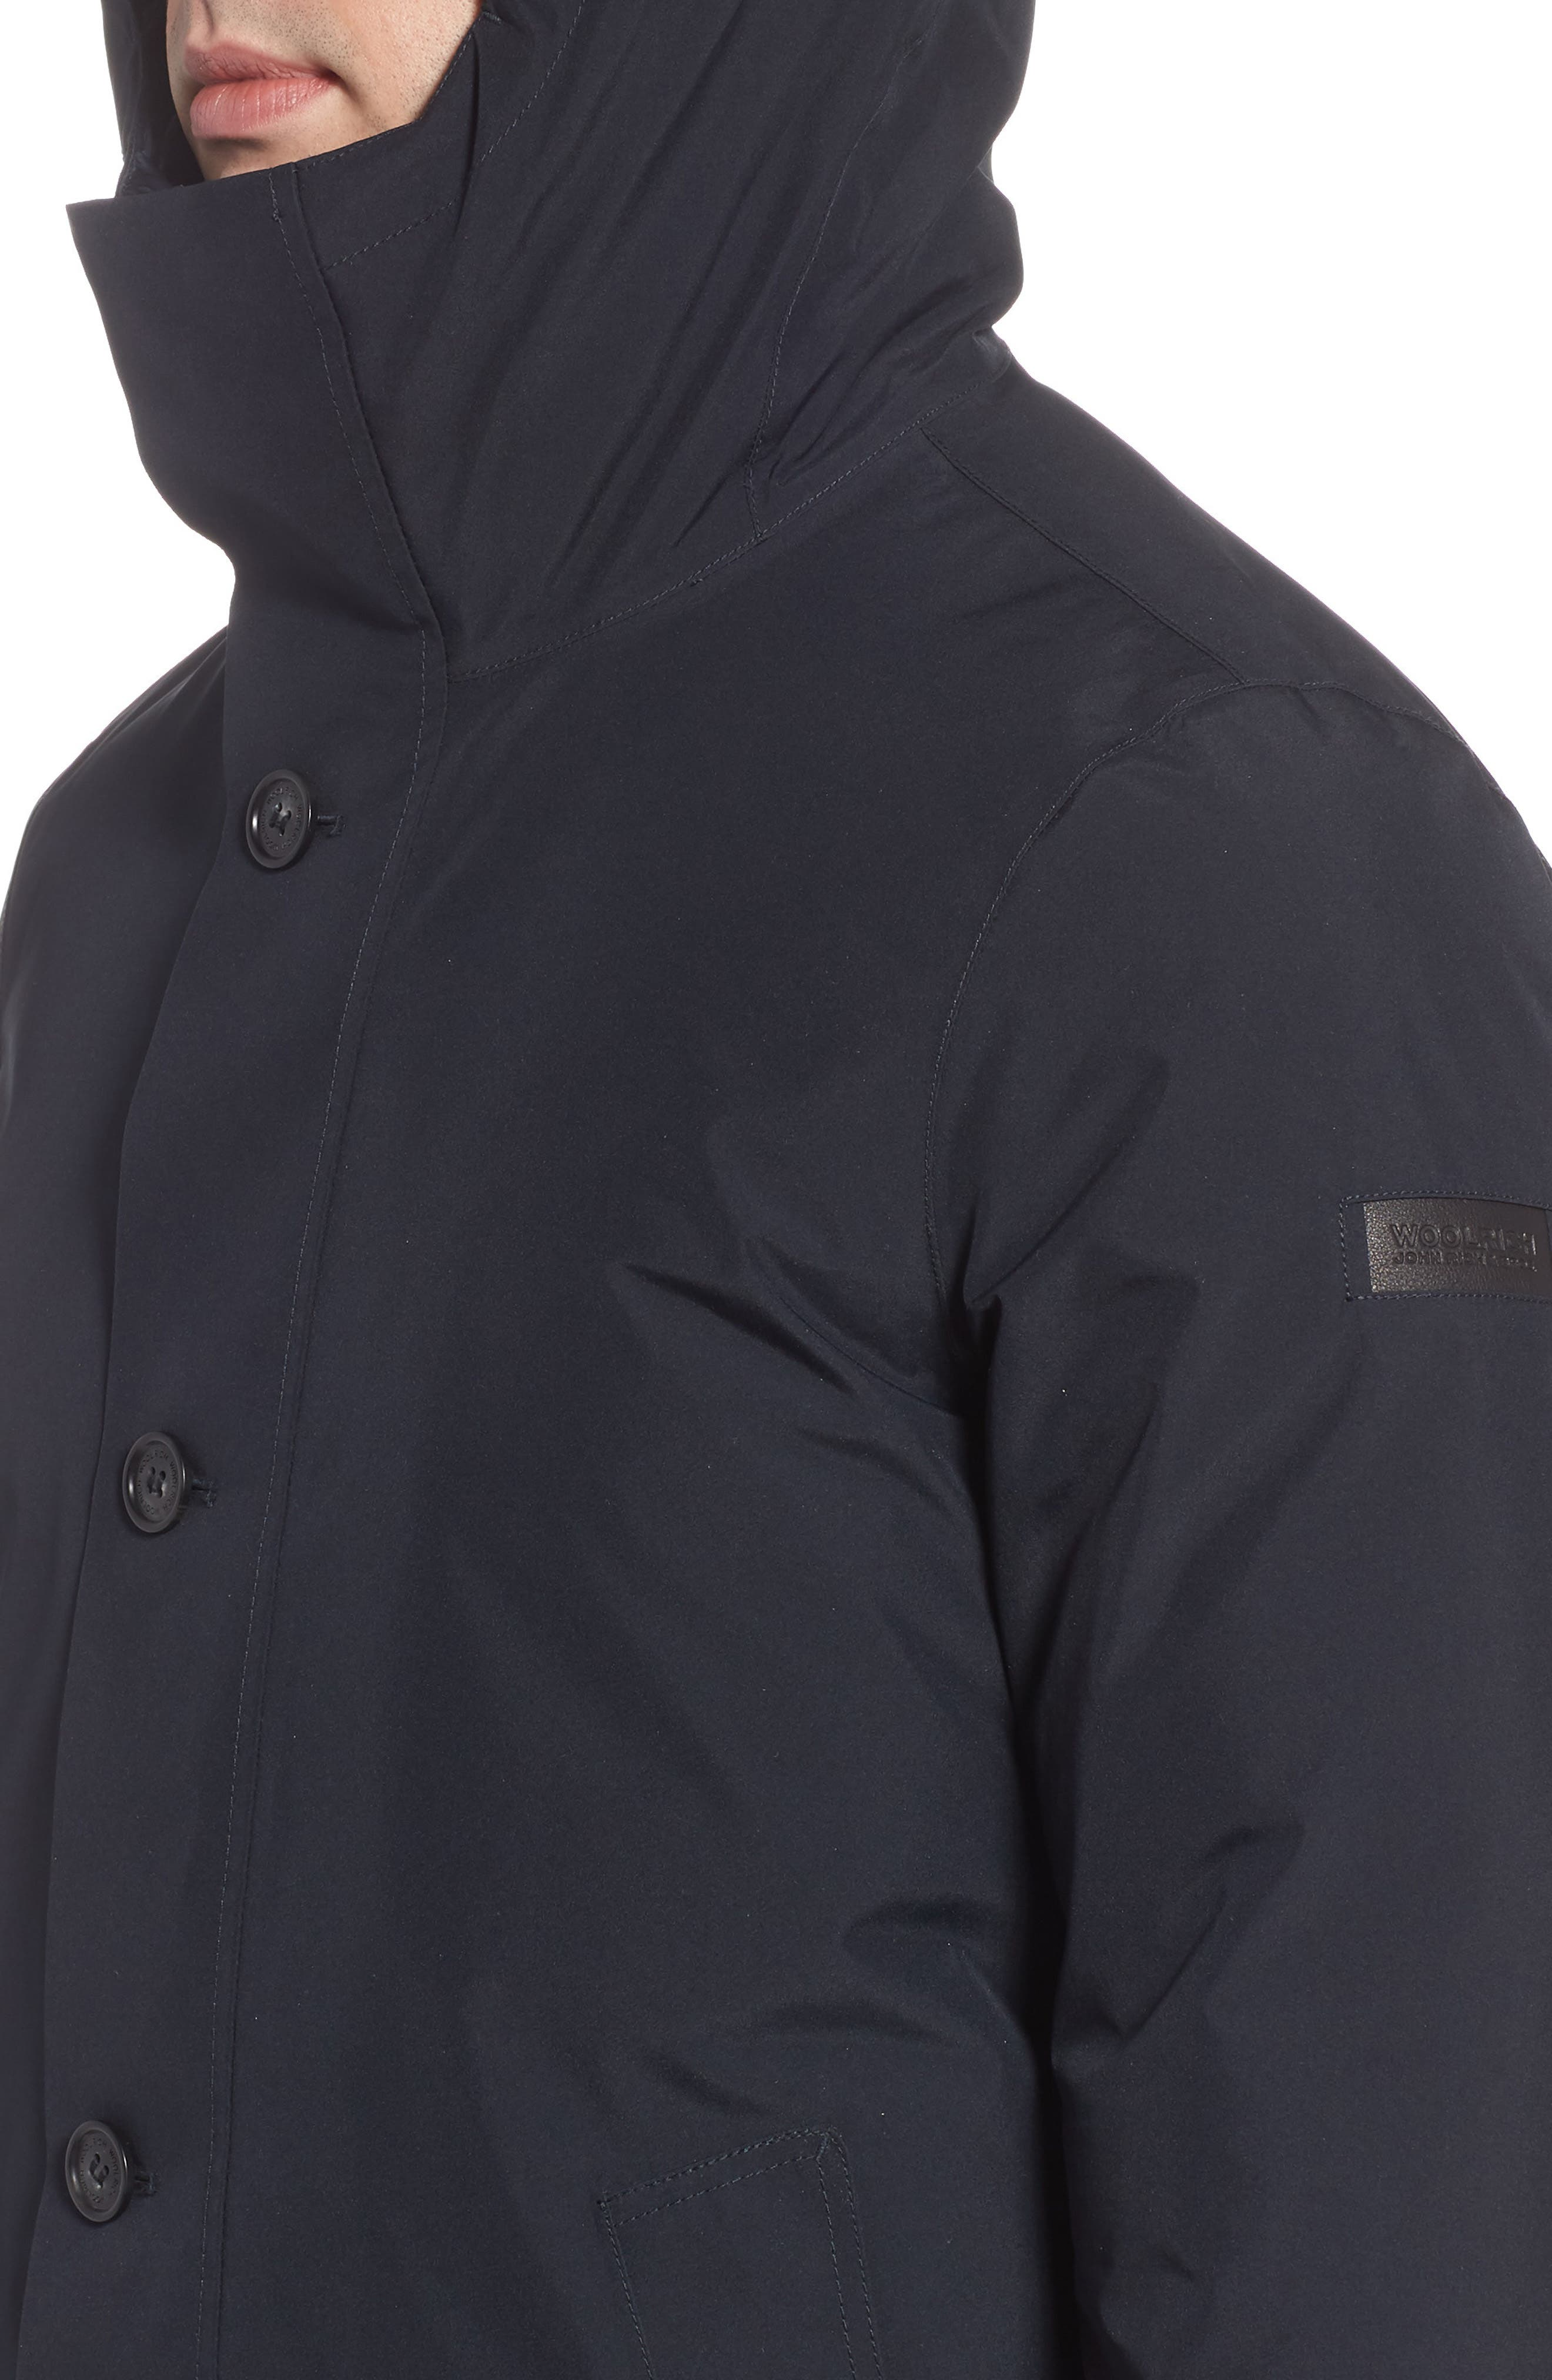 WOOLRICH,                             Waterproof Gore-Tex<sup>®</sup> Alpine Jacket,                             Alternate thumbnail 4, color,                             414